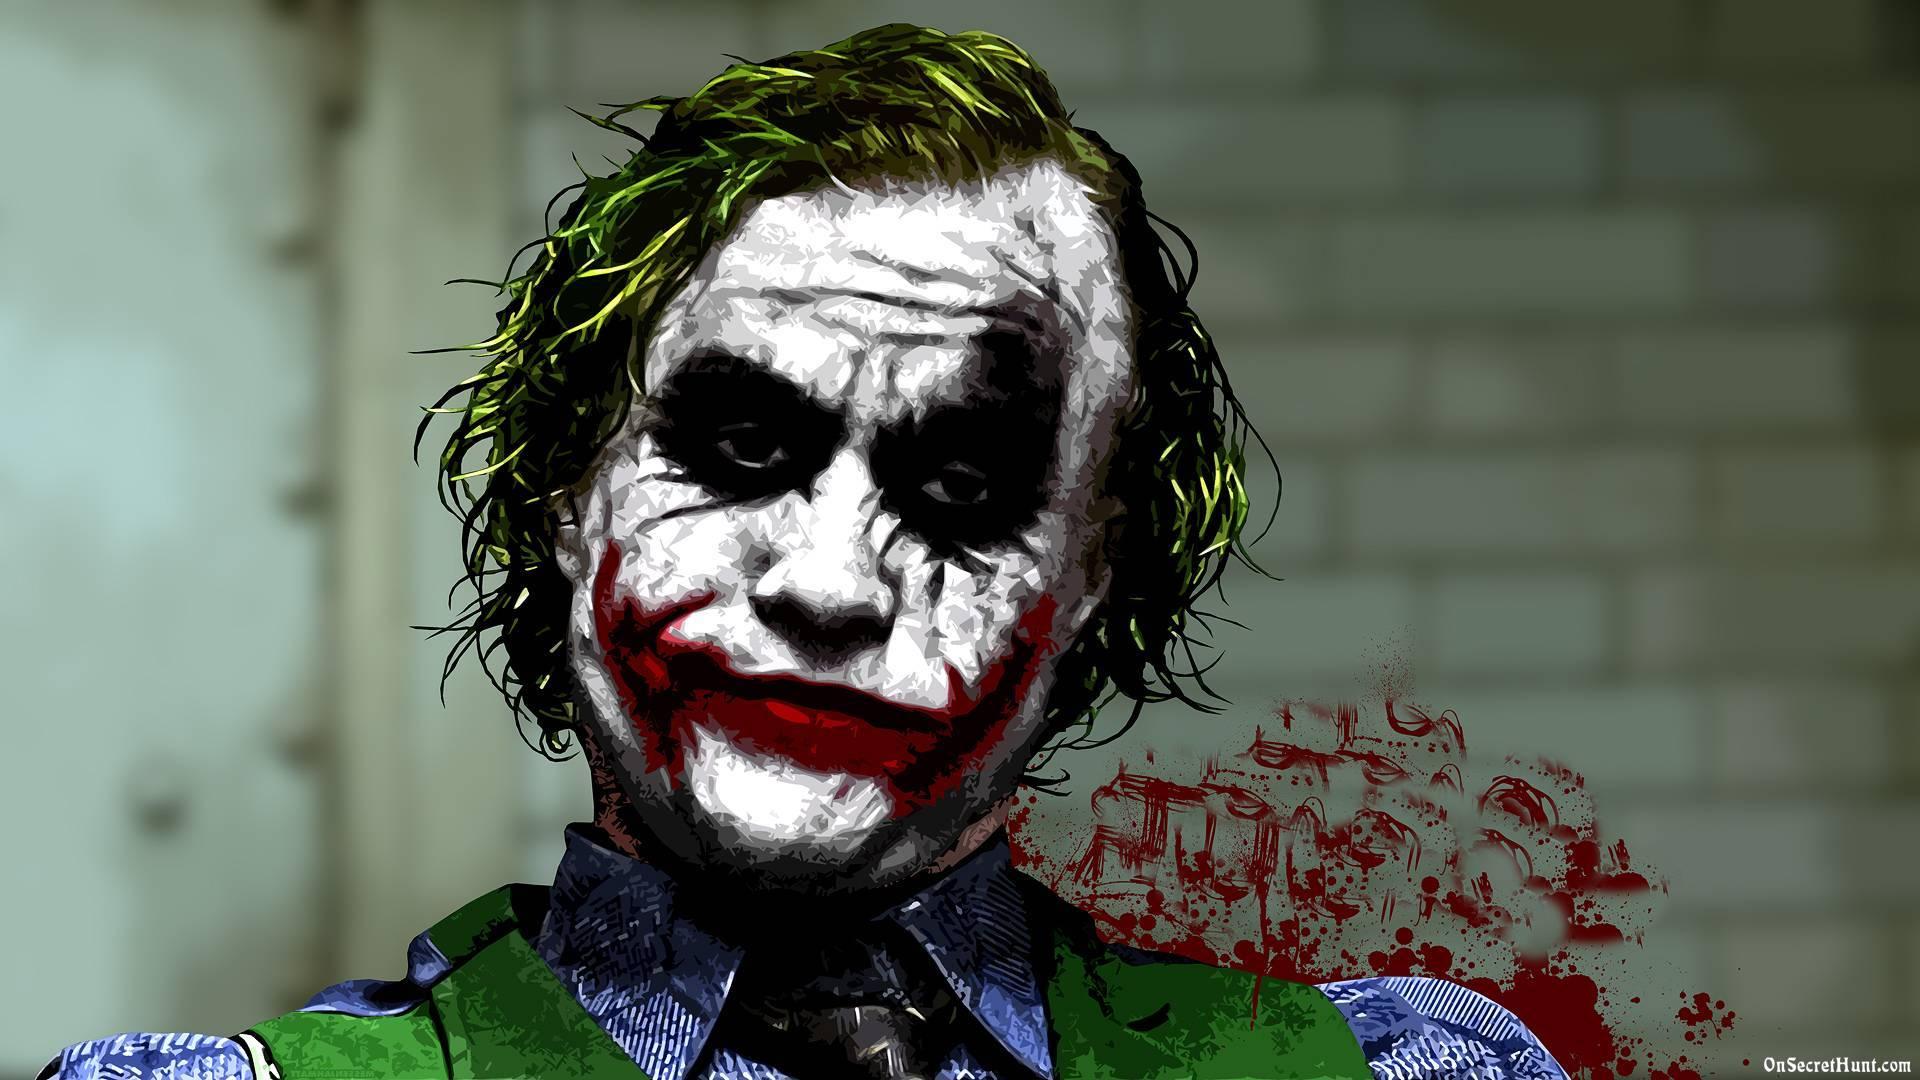 Joker Wallpaper Hd Iphone 5 Joker Wallpapers High Quality Download Free